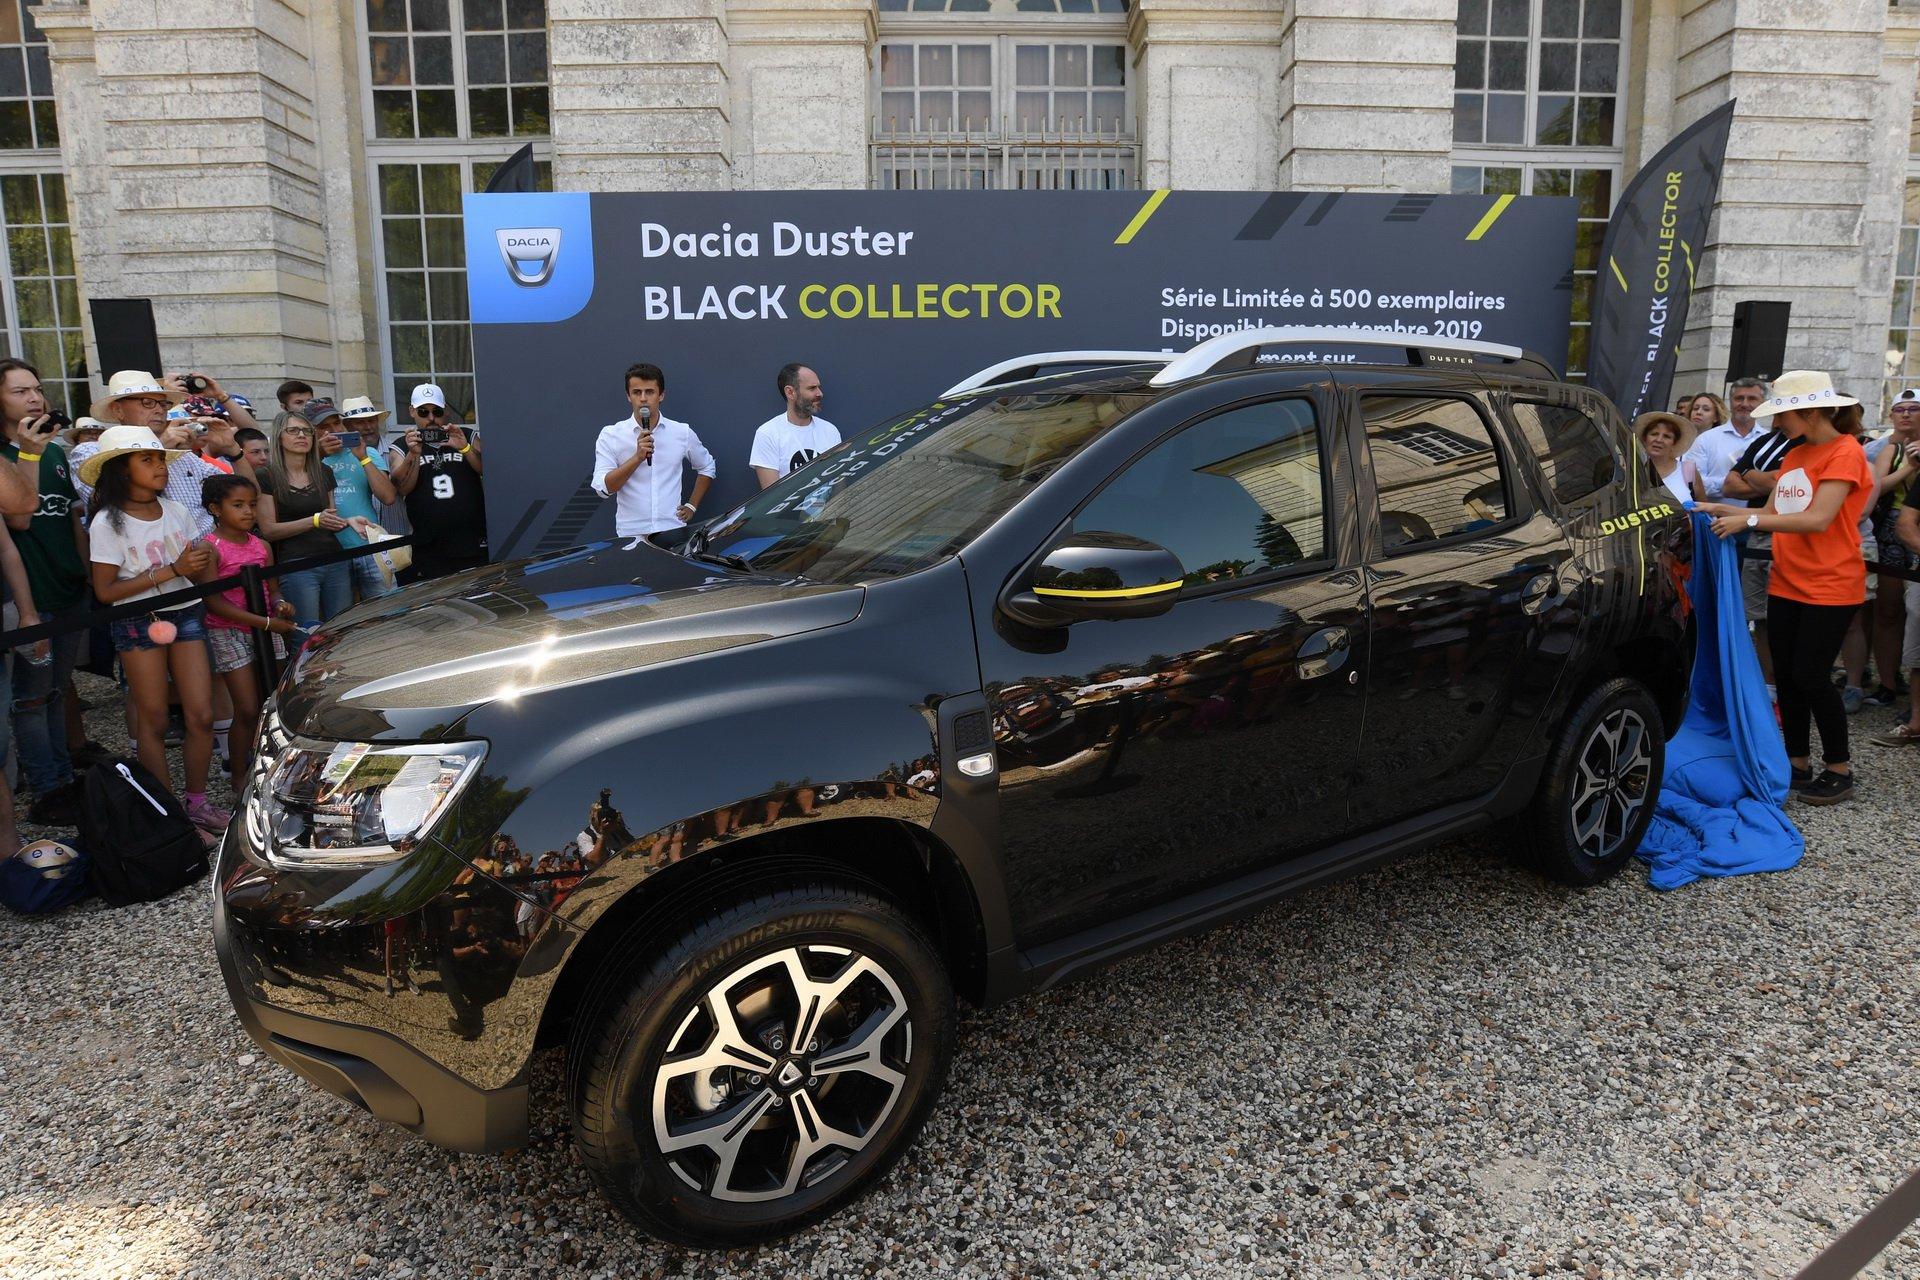 Dacia_Duster_Black_Collector_Edition_0001